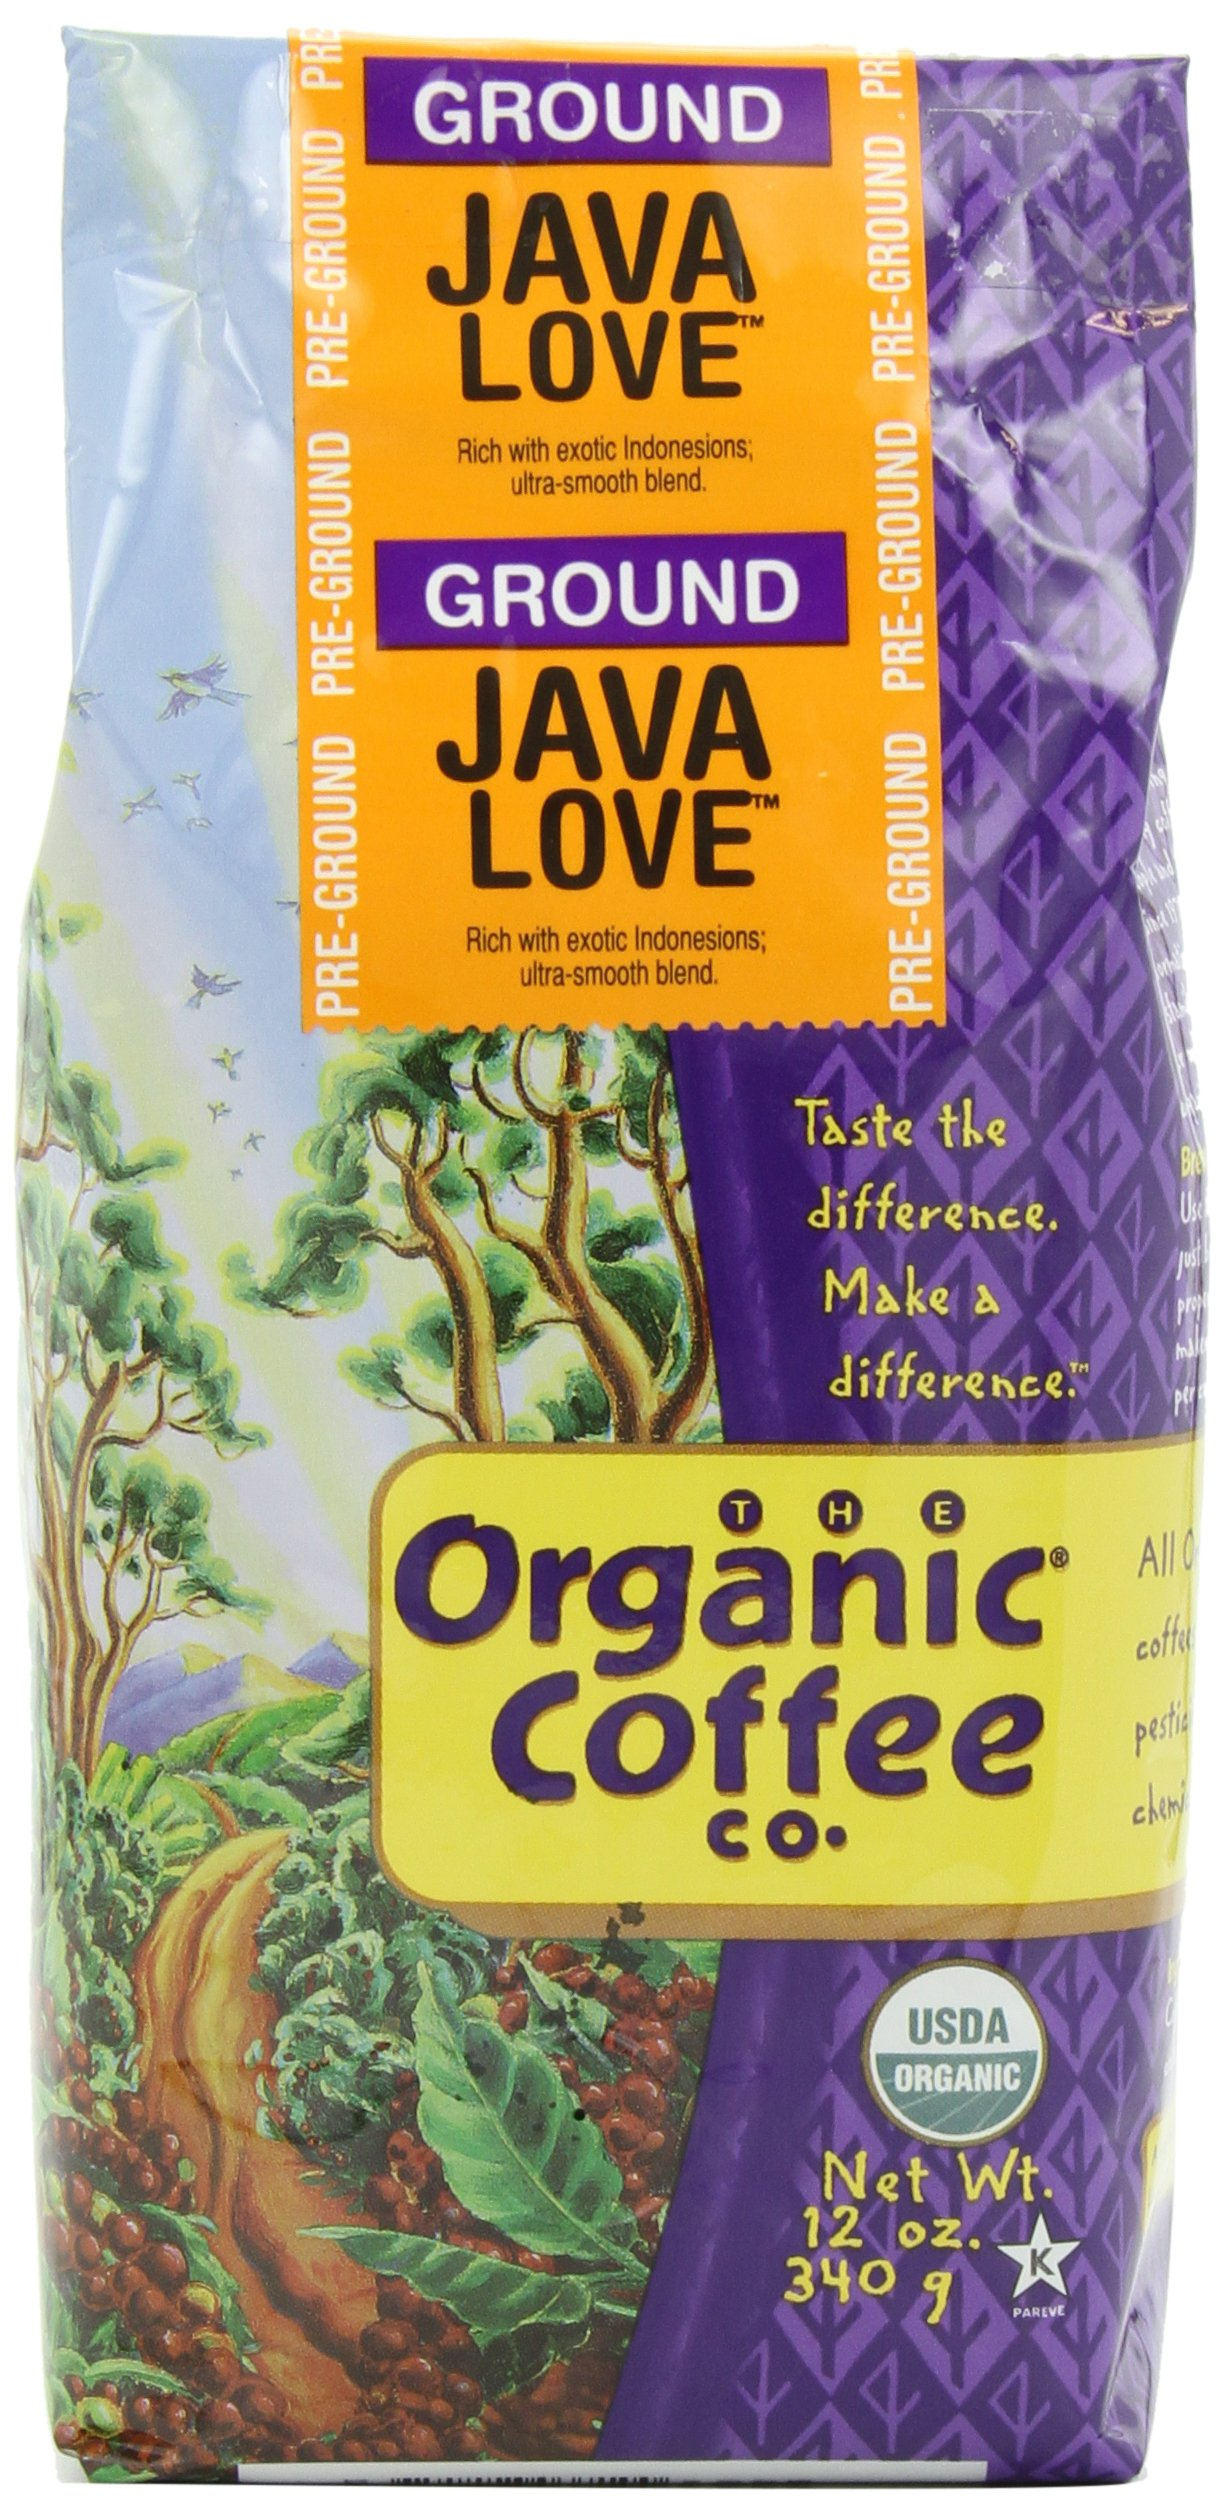 The Organic Coffee Co. Ground, Java Love, 12 Ounce